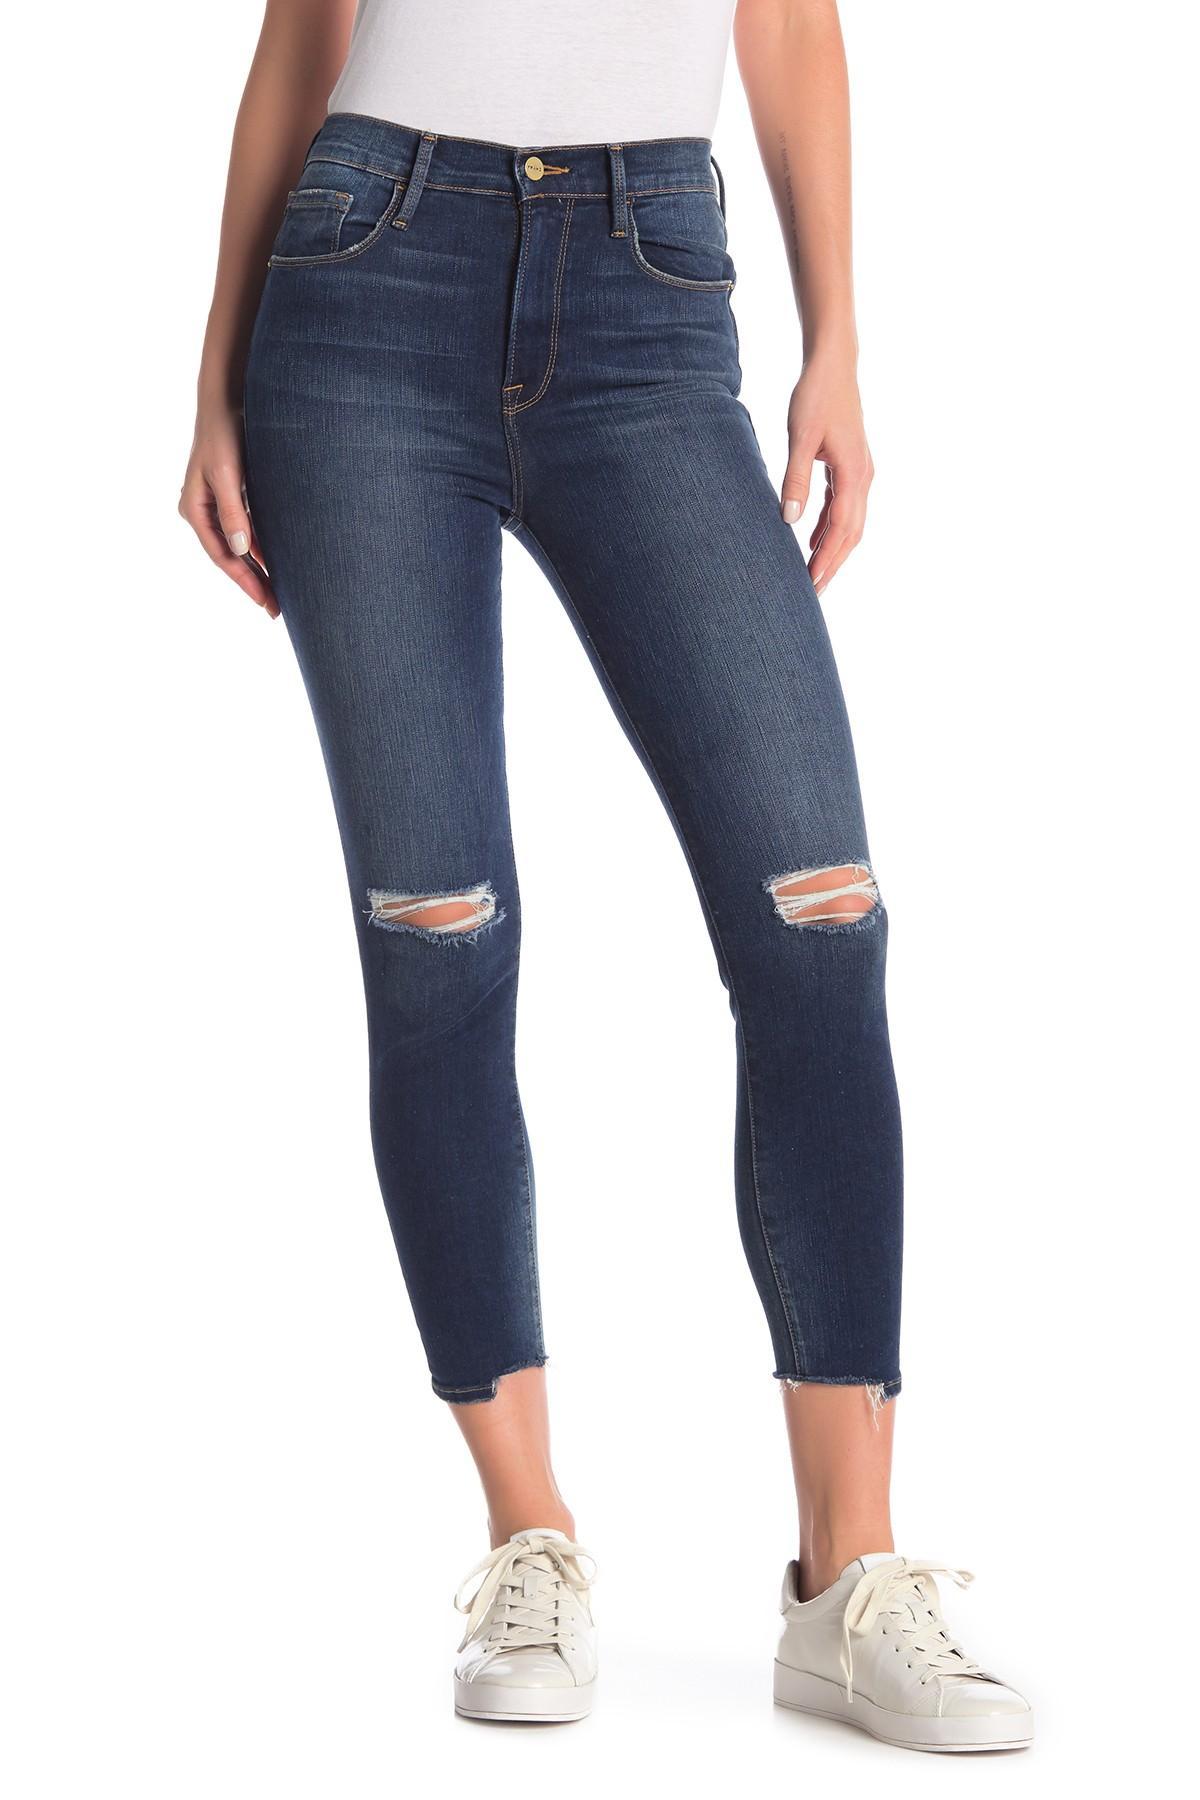 d87f767447df9 Lyst - FRAME Ali Distressed High Rise Cigarette Jeans in Blue